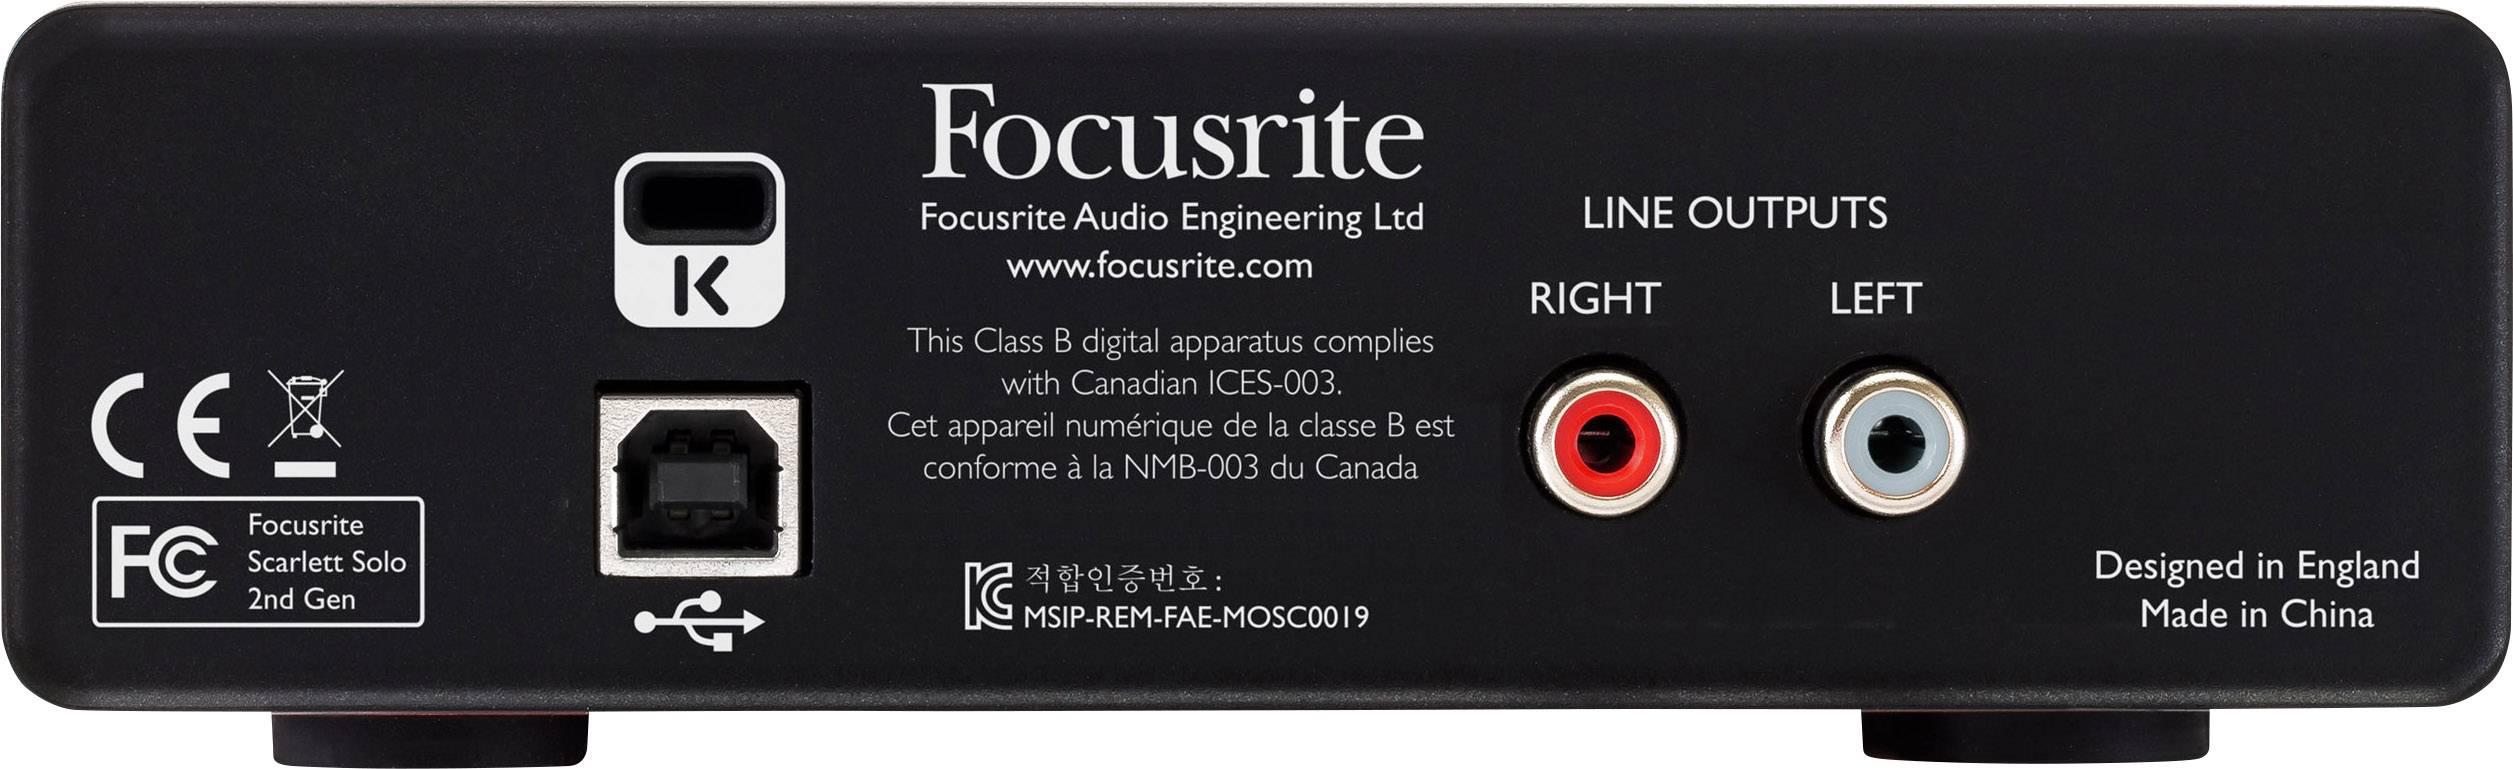 Audio interface Focusrite SCARLETT SOLO 2ND GEN Monitor